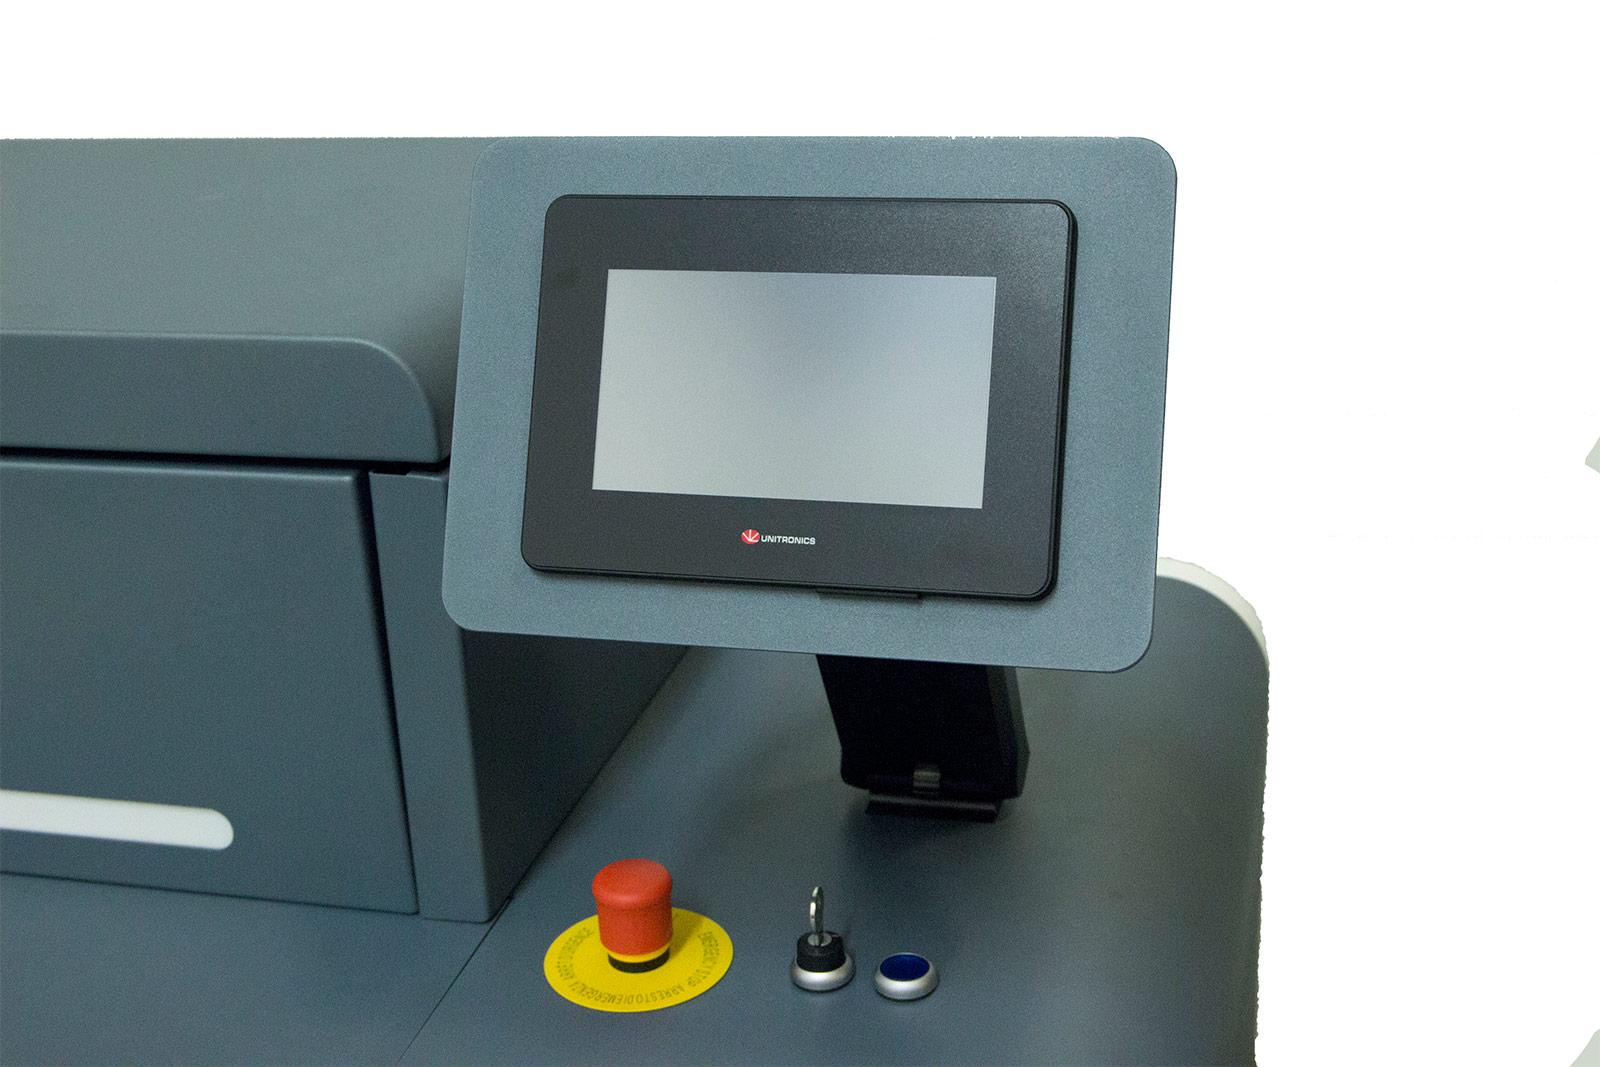 Laserclean - ALCS 1000 S display